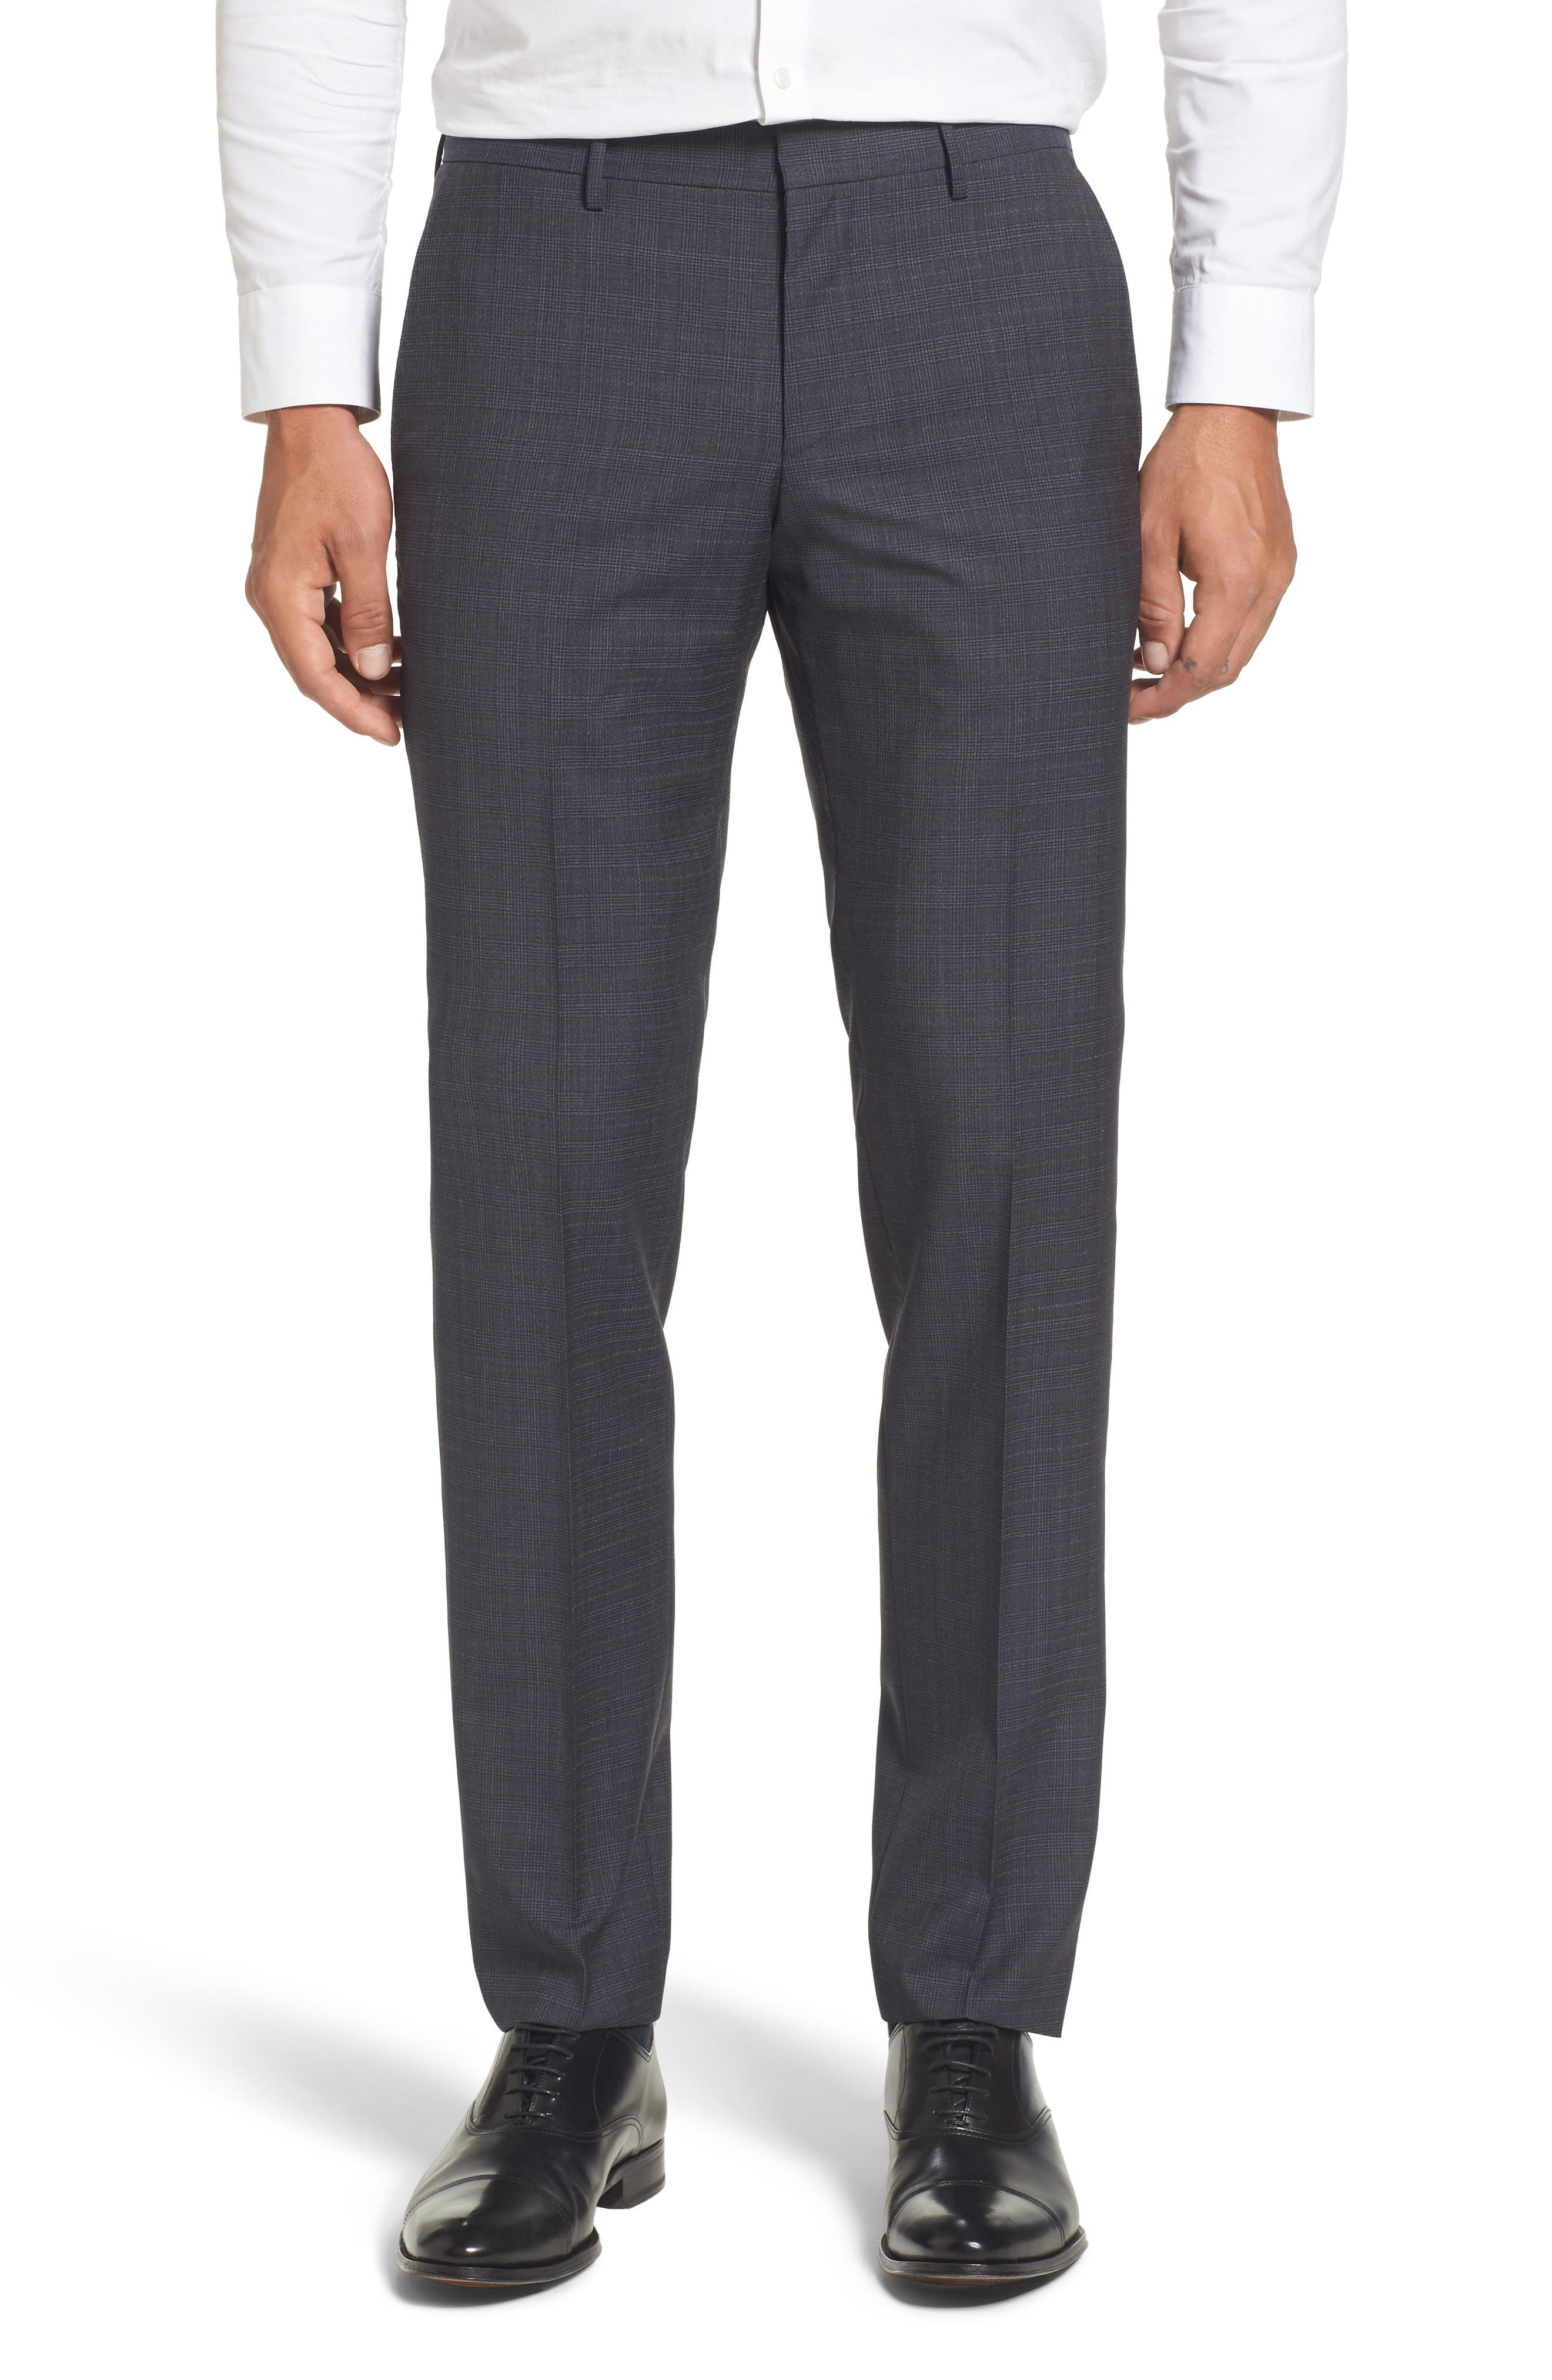 Benso Regular Fit Trousers,                             Main thumbnail 1, color,                             410